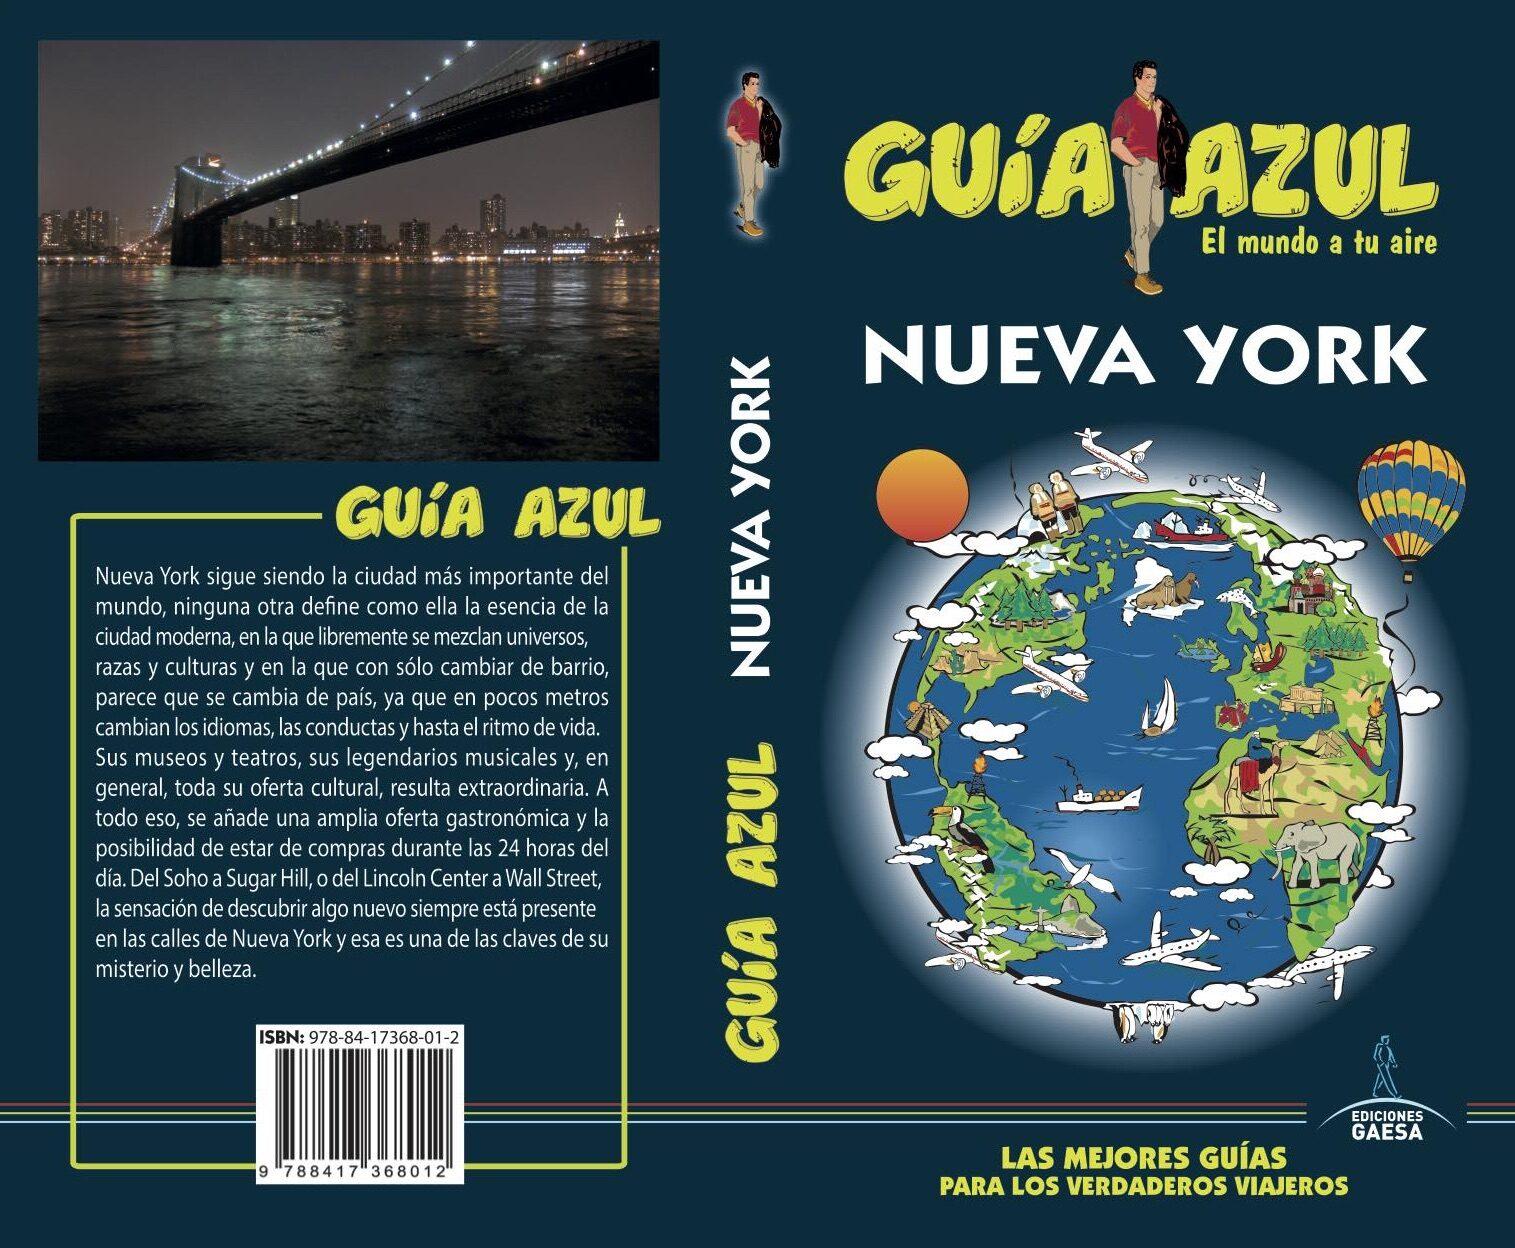 nueva york 2018 (guia azul) 7ª ed.-manuel monreal-luis mazarrasa-9788417368012